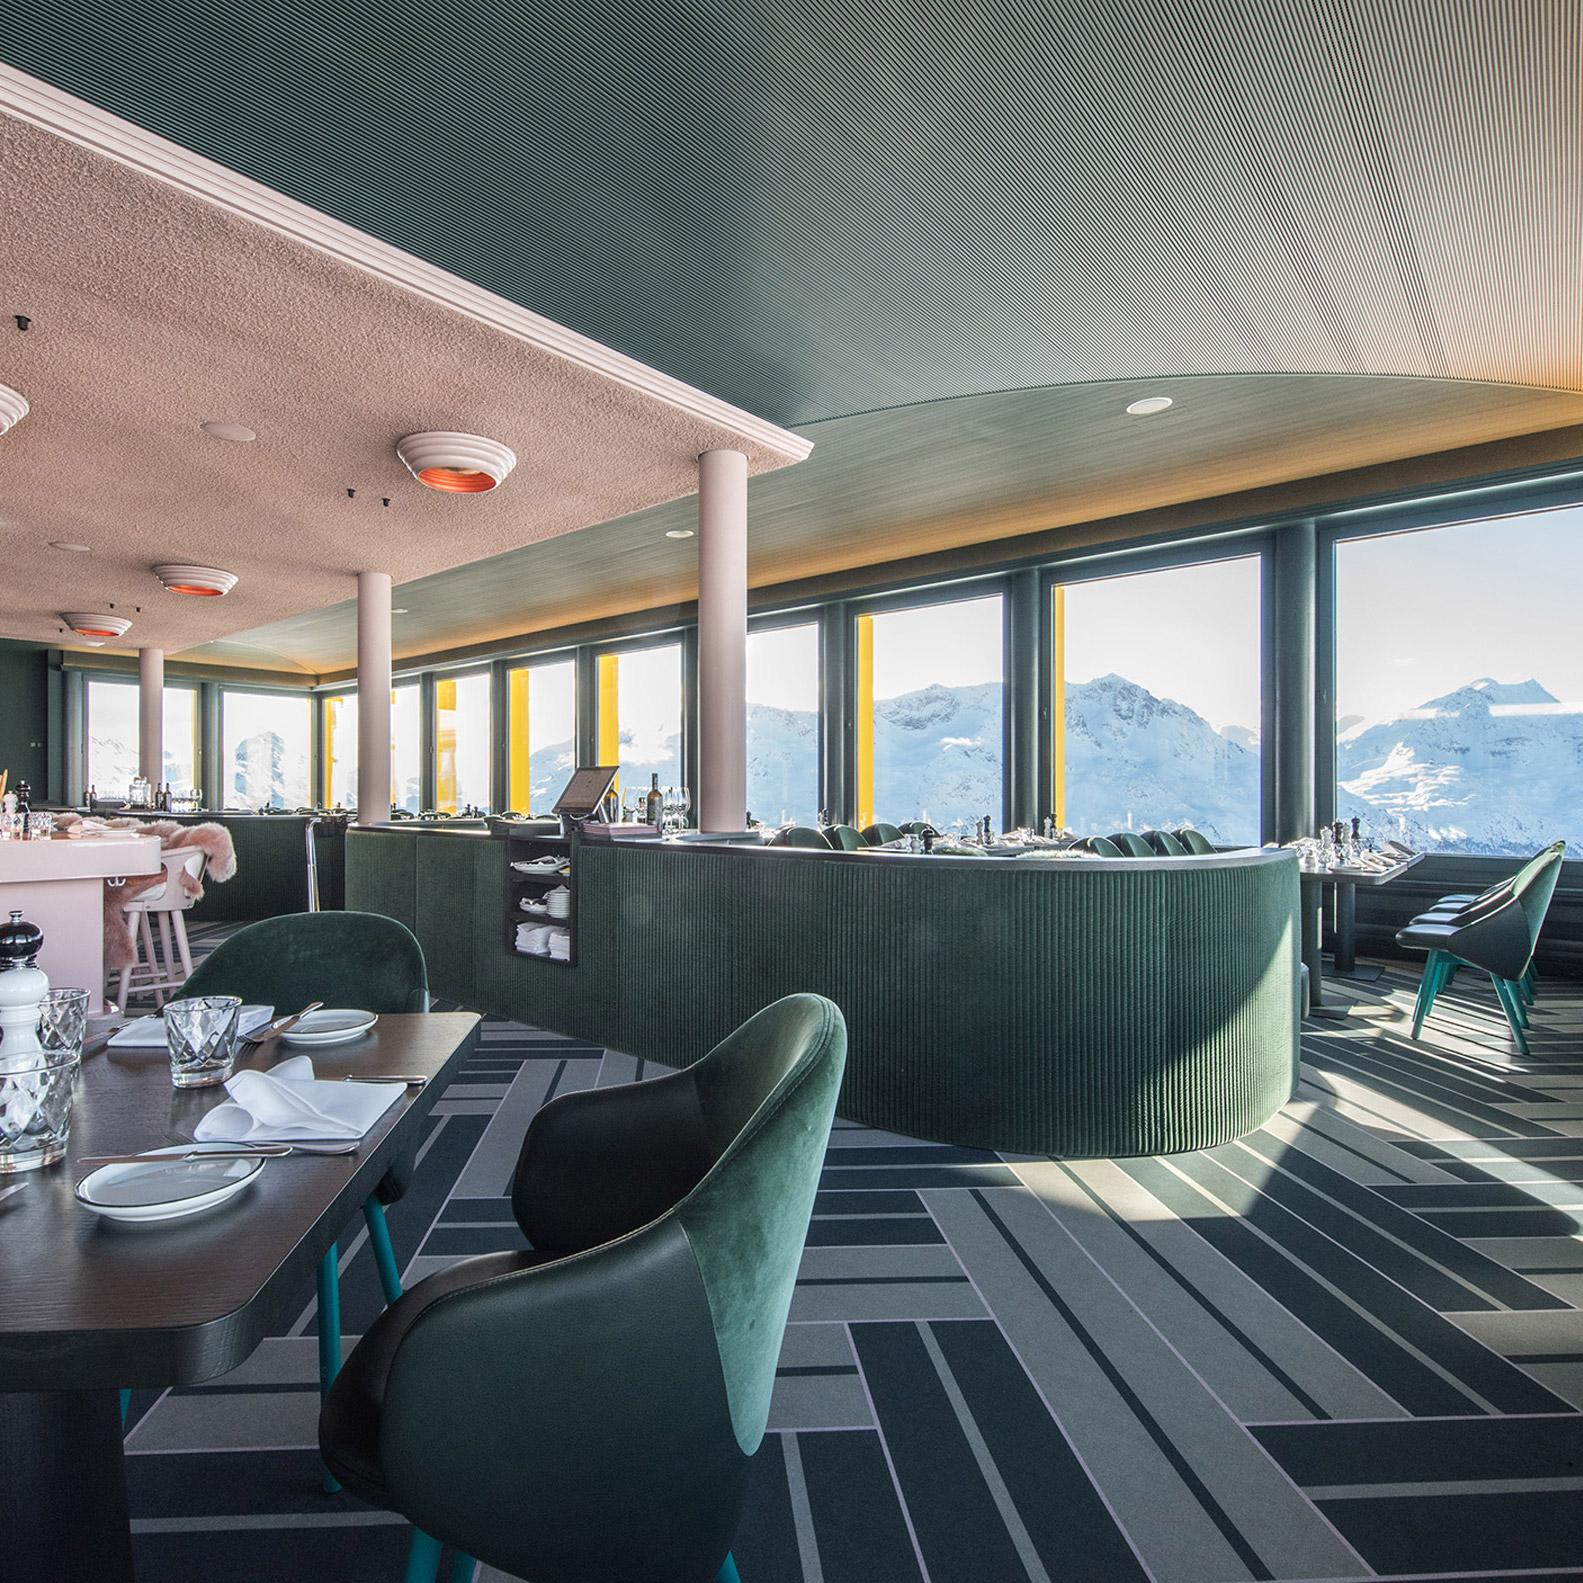 Forbo designs waterproof Flotex flooring for ski resort interiors